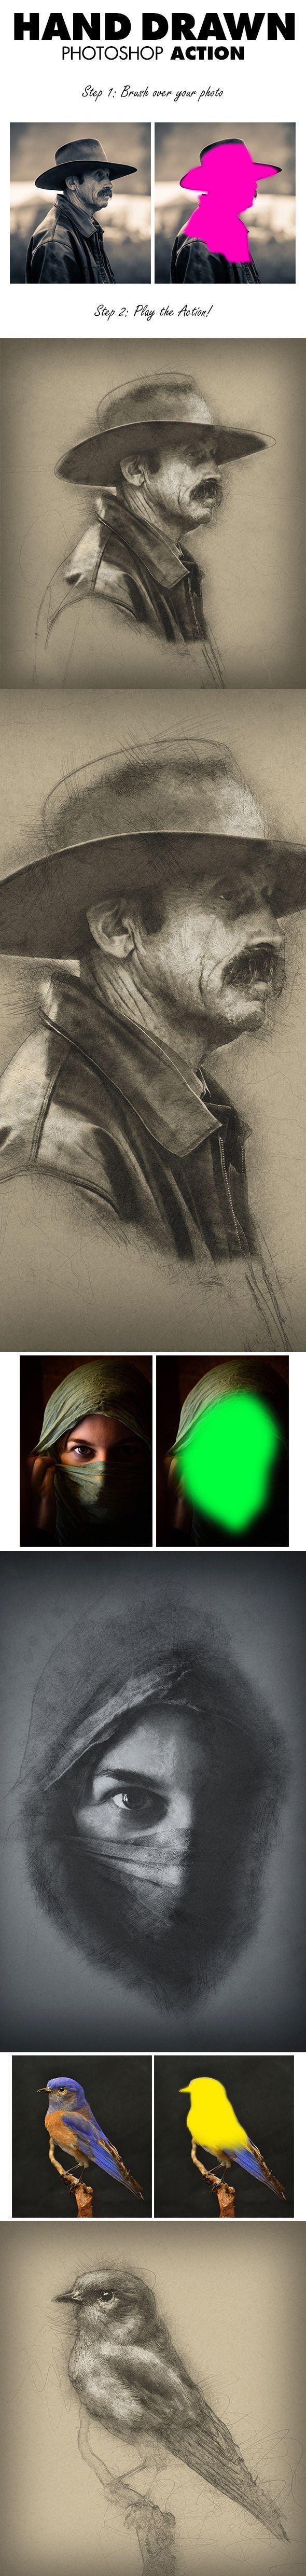 16-Hand Drawn Photoshop Action